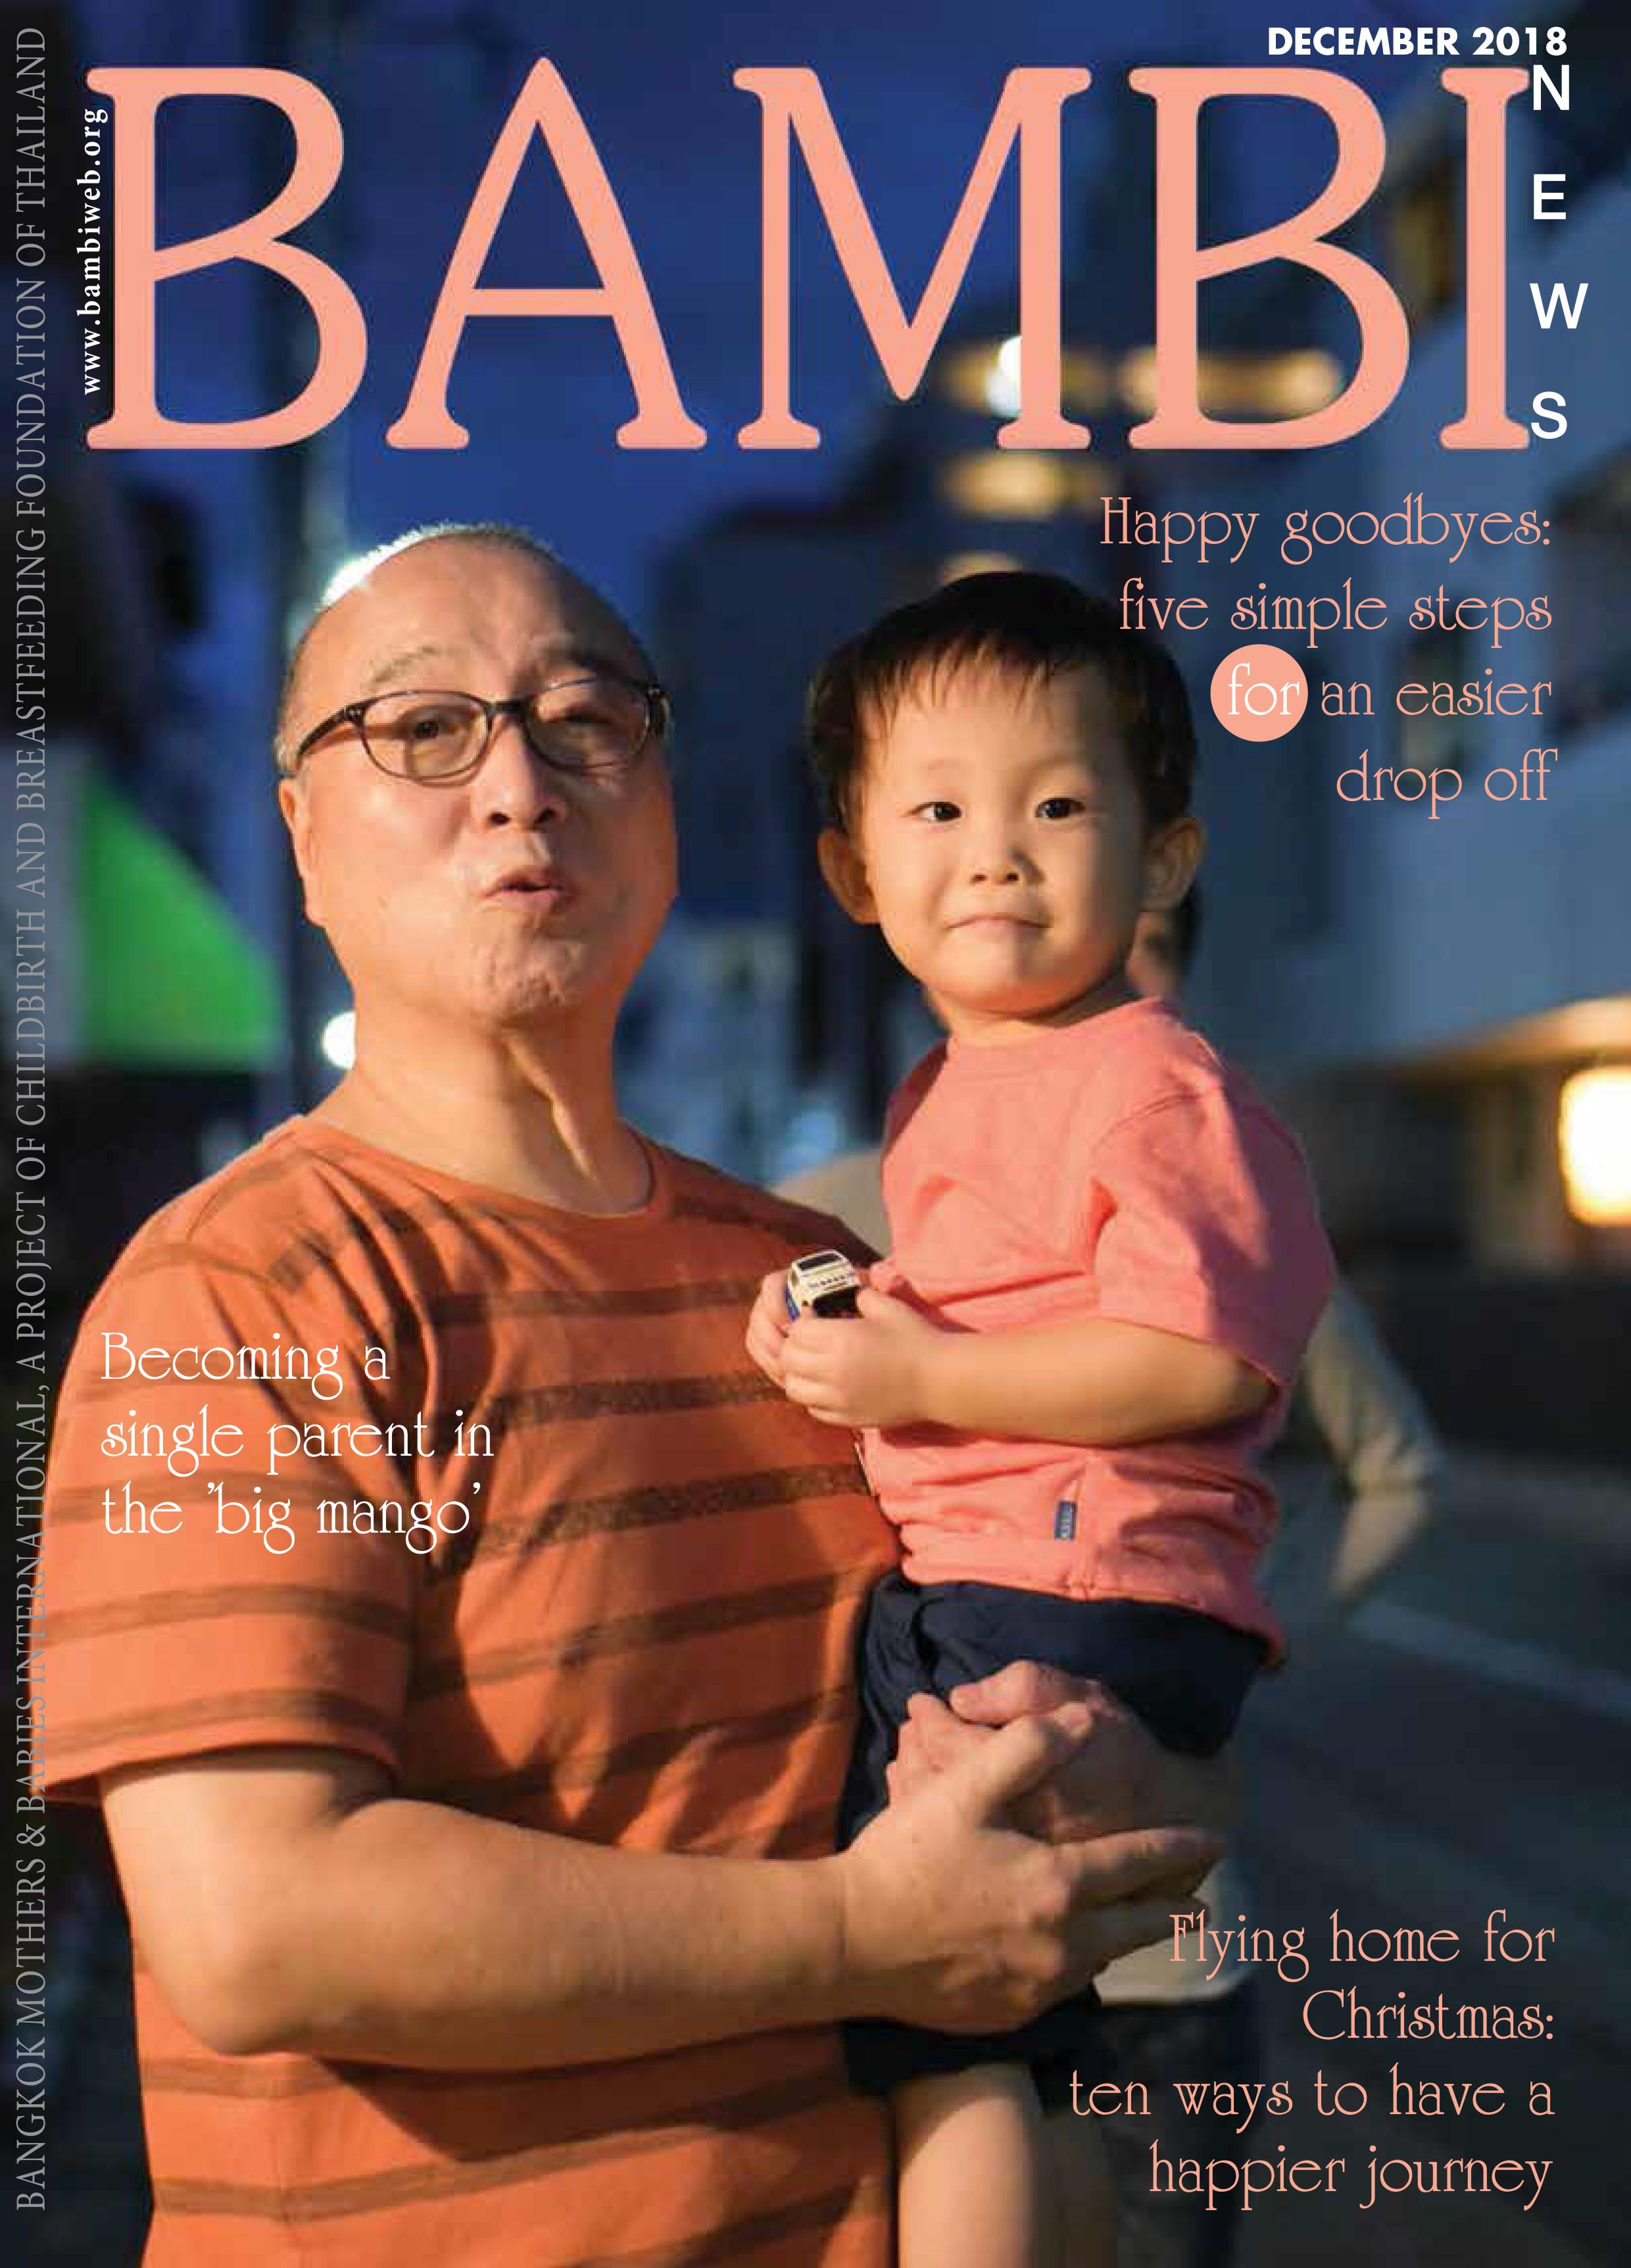 BAMBI News December 2018